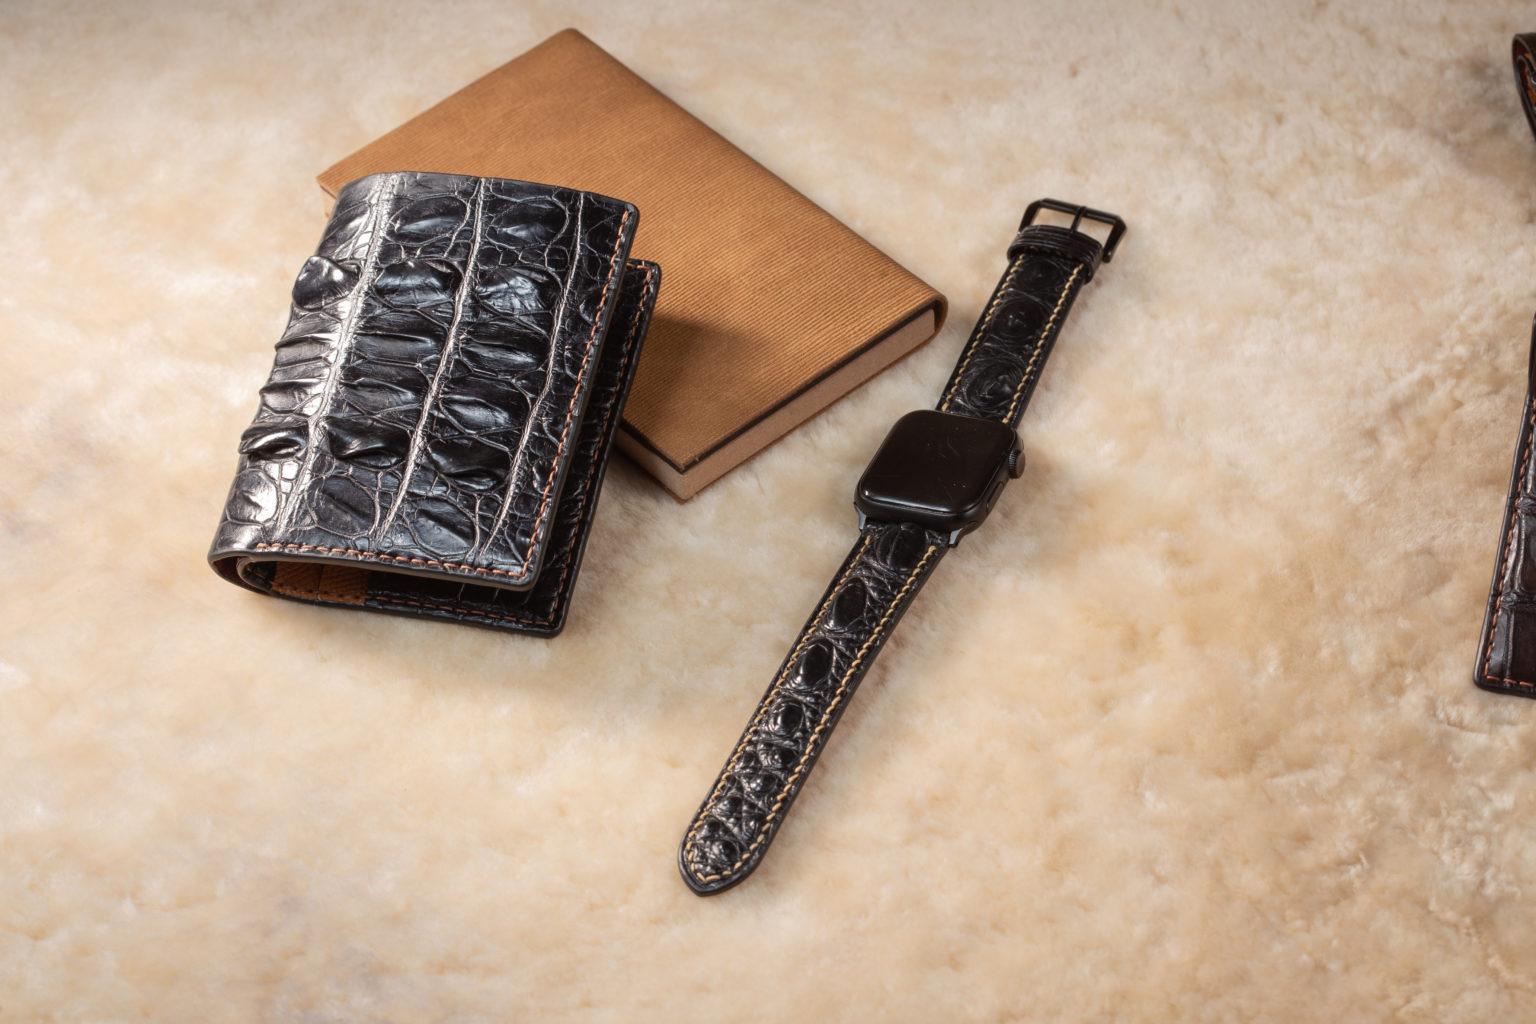 Dây đồng hồ da cá sấu handmade HBDDCS10